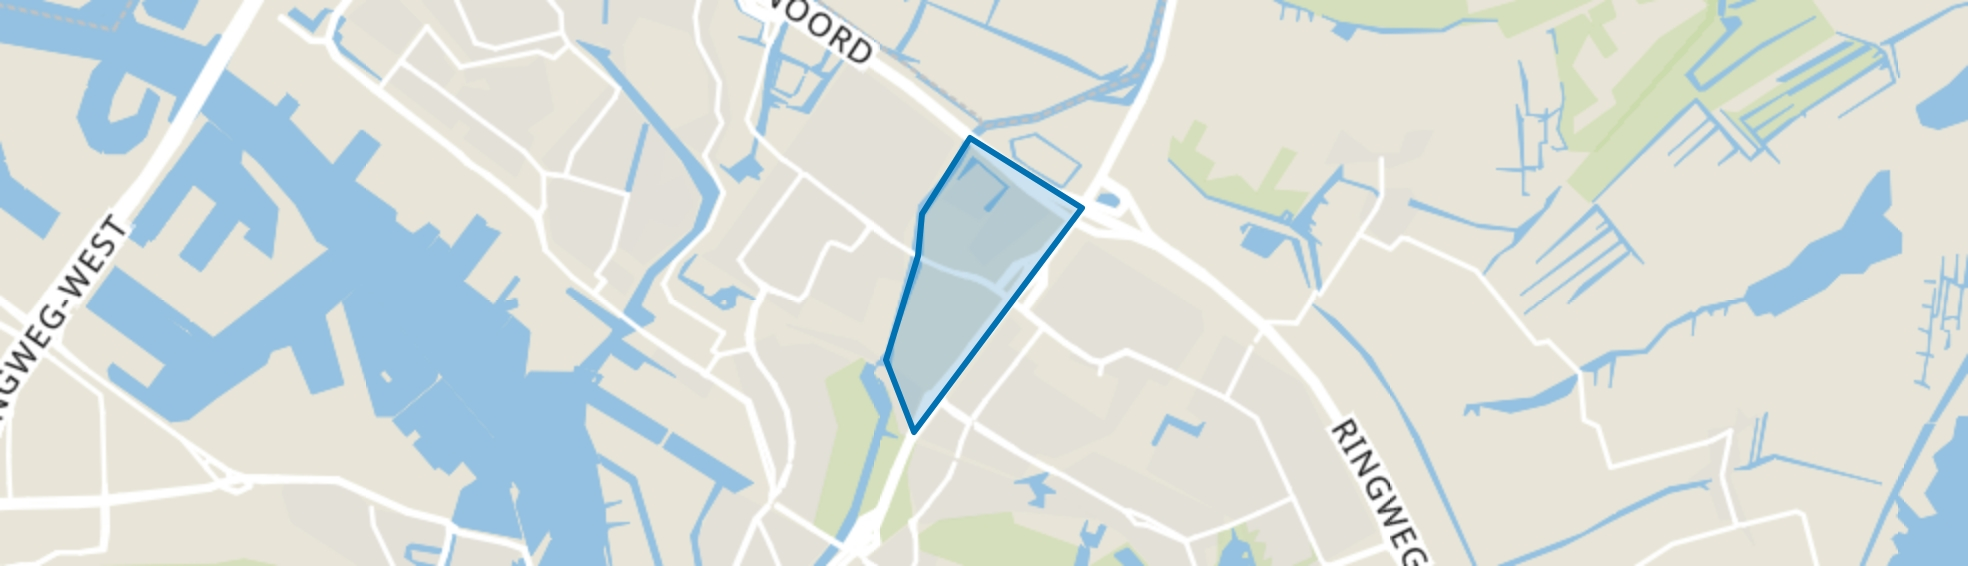 Elzenhagen, Amsterdam map